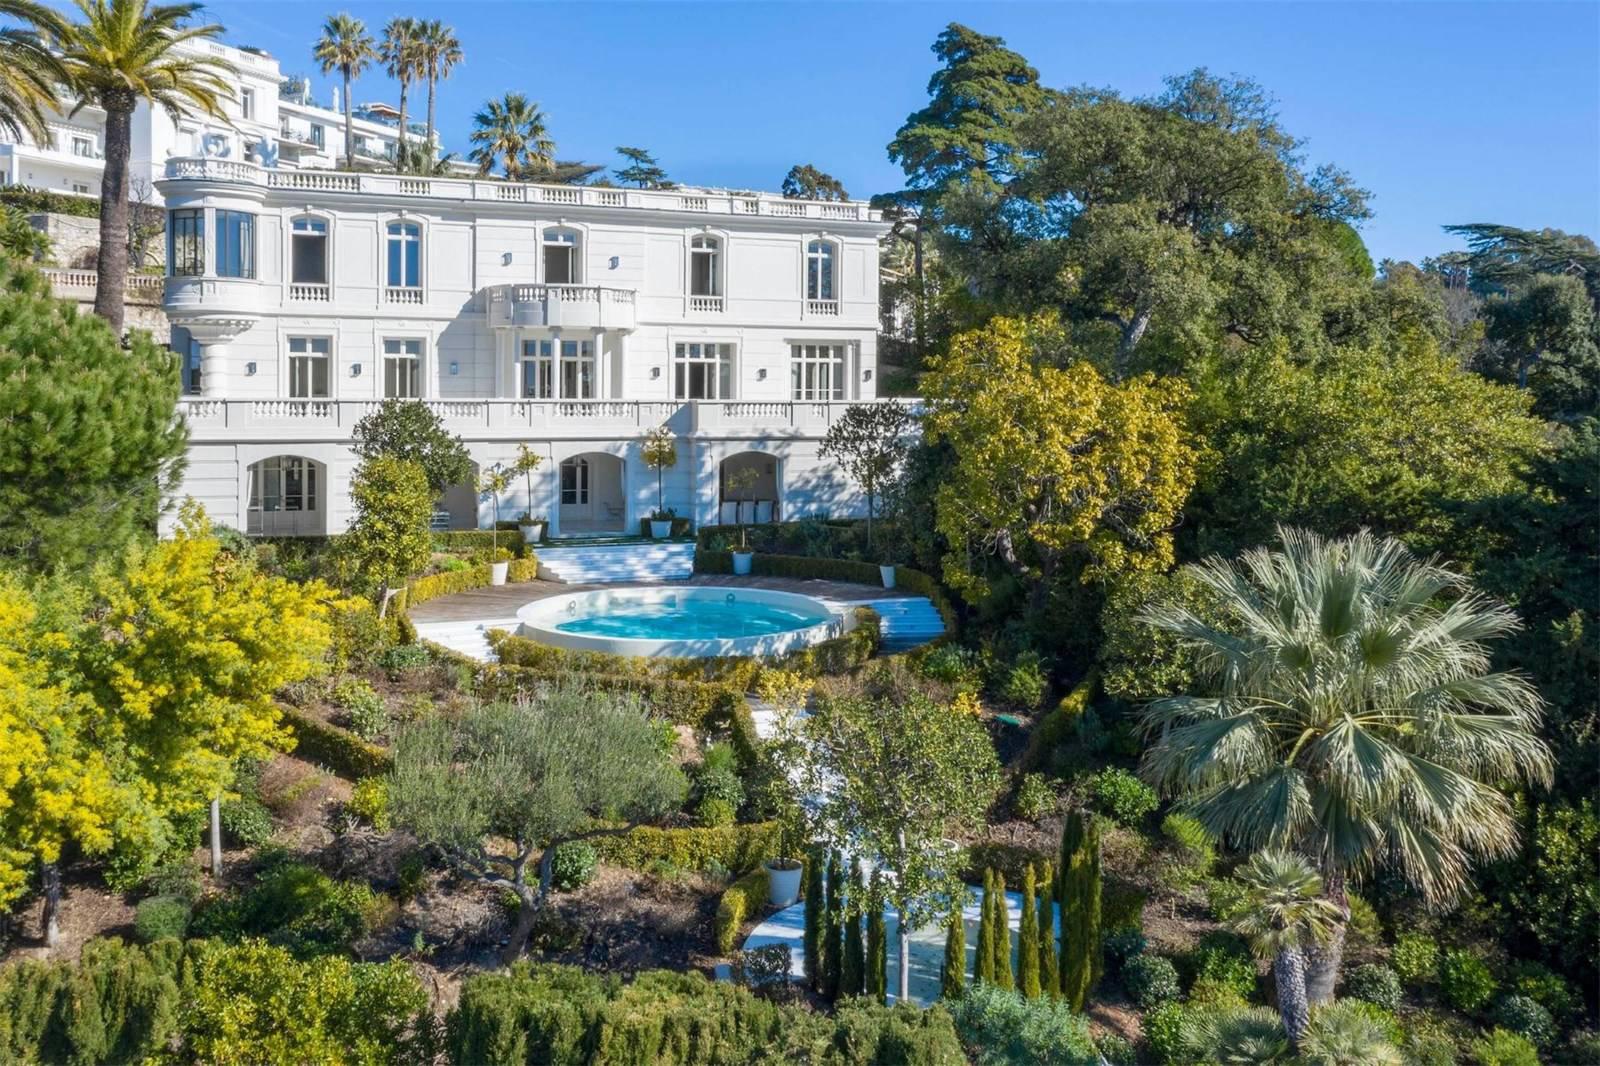 La Favorite residence in Cannes